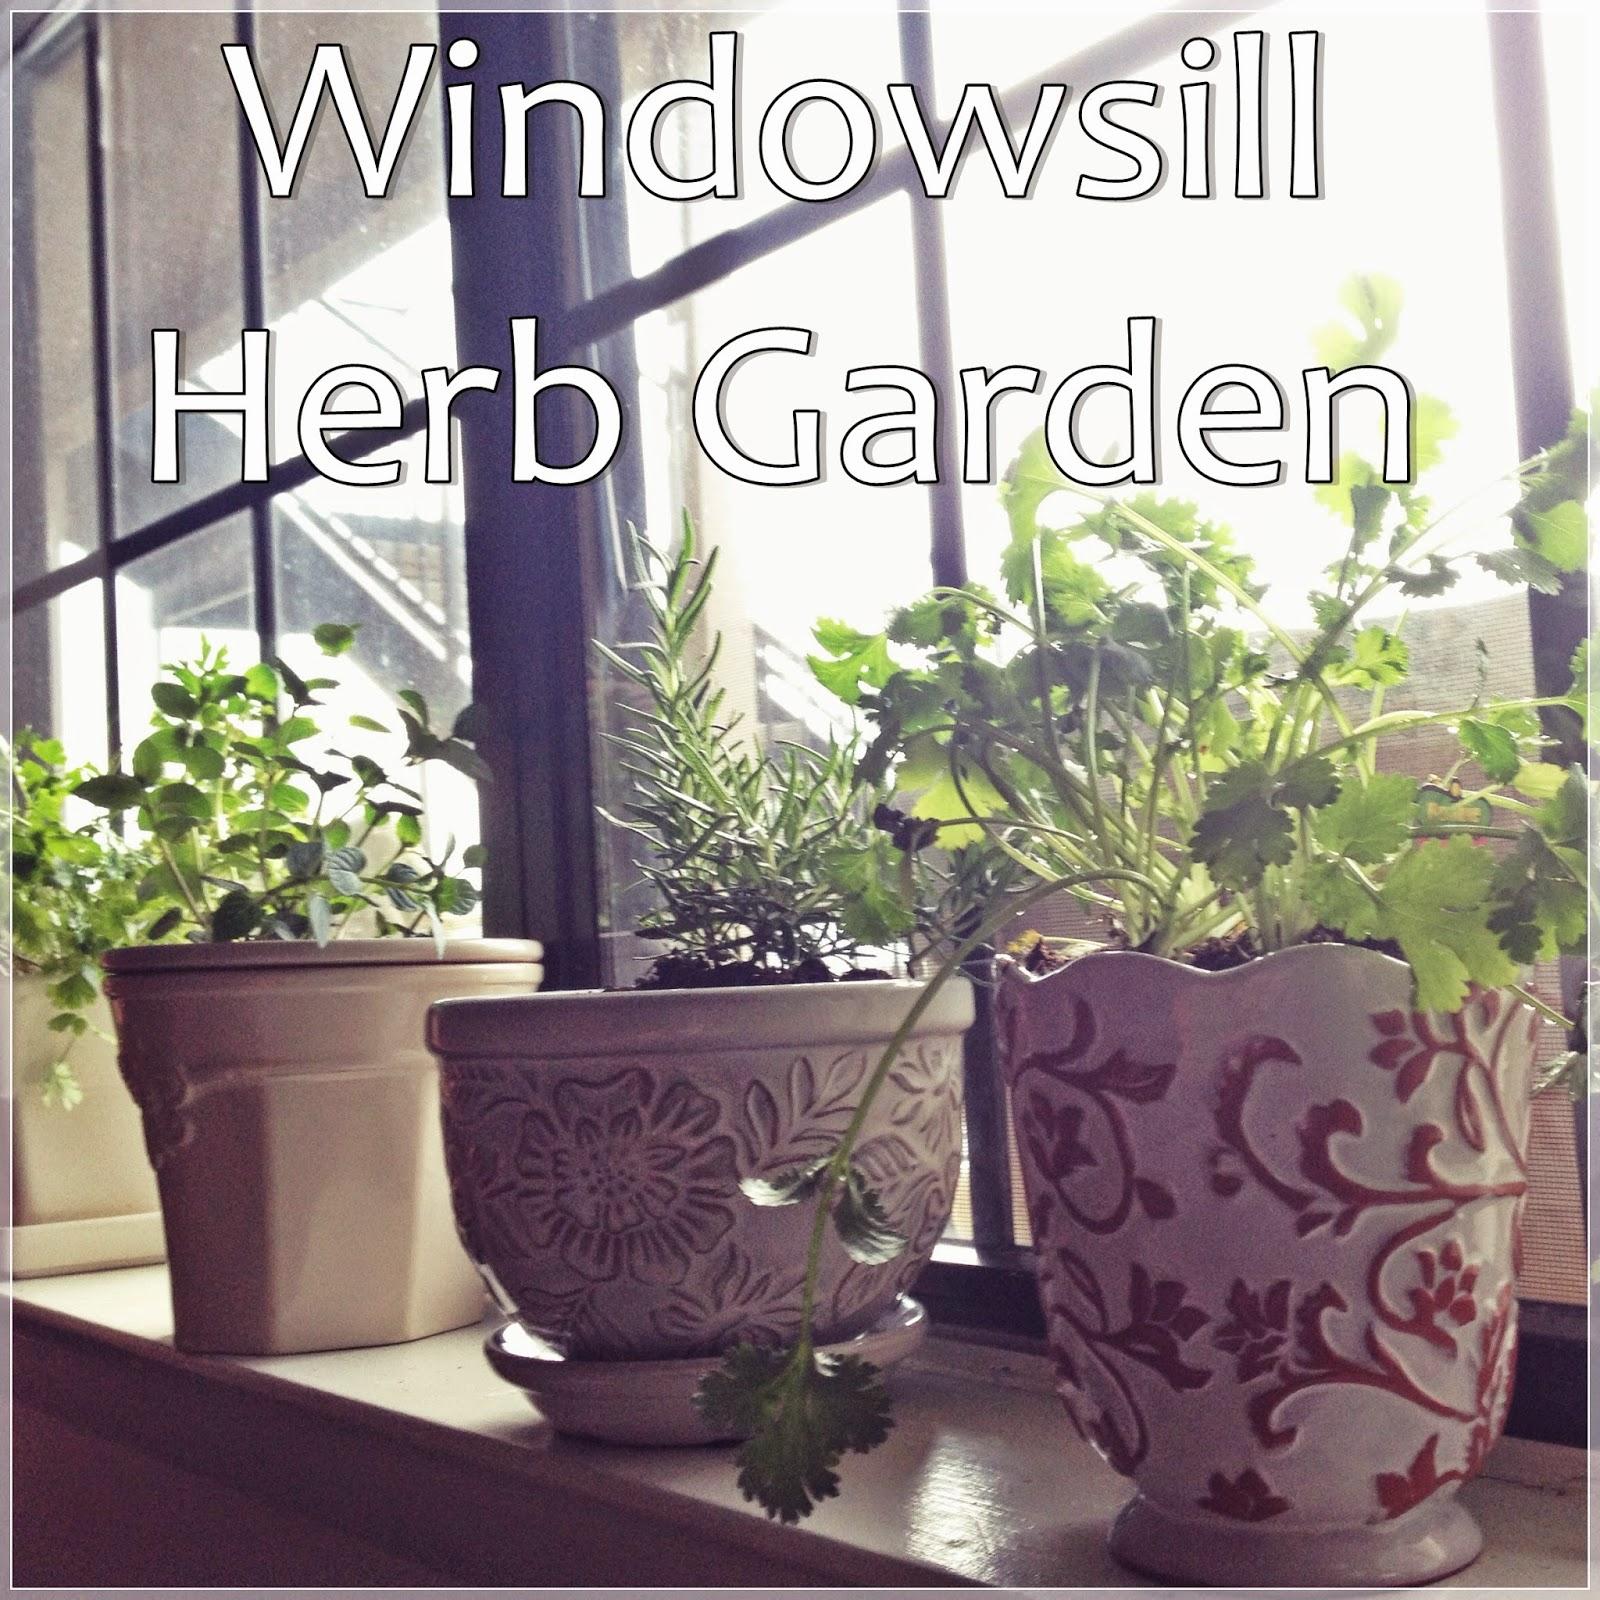 Let's Drink Coffee, Darling: Windowsill Herb Garden